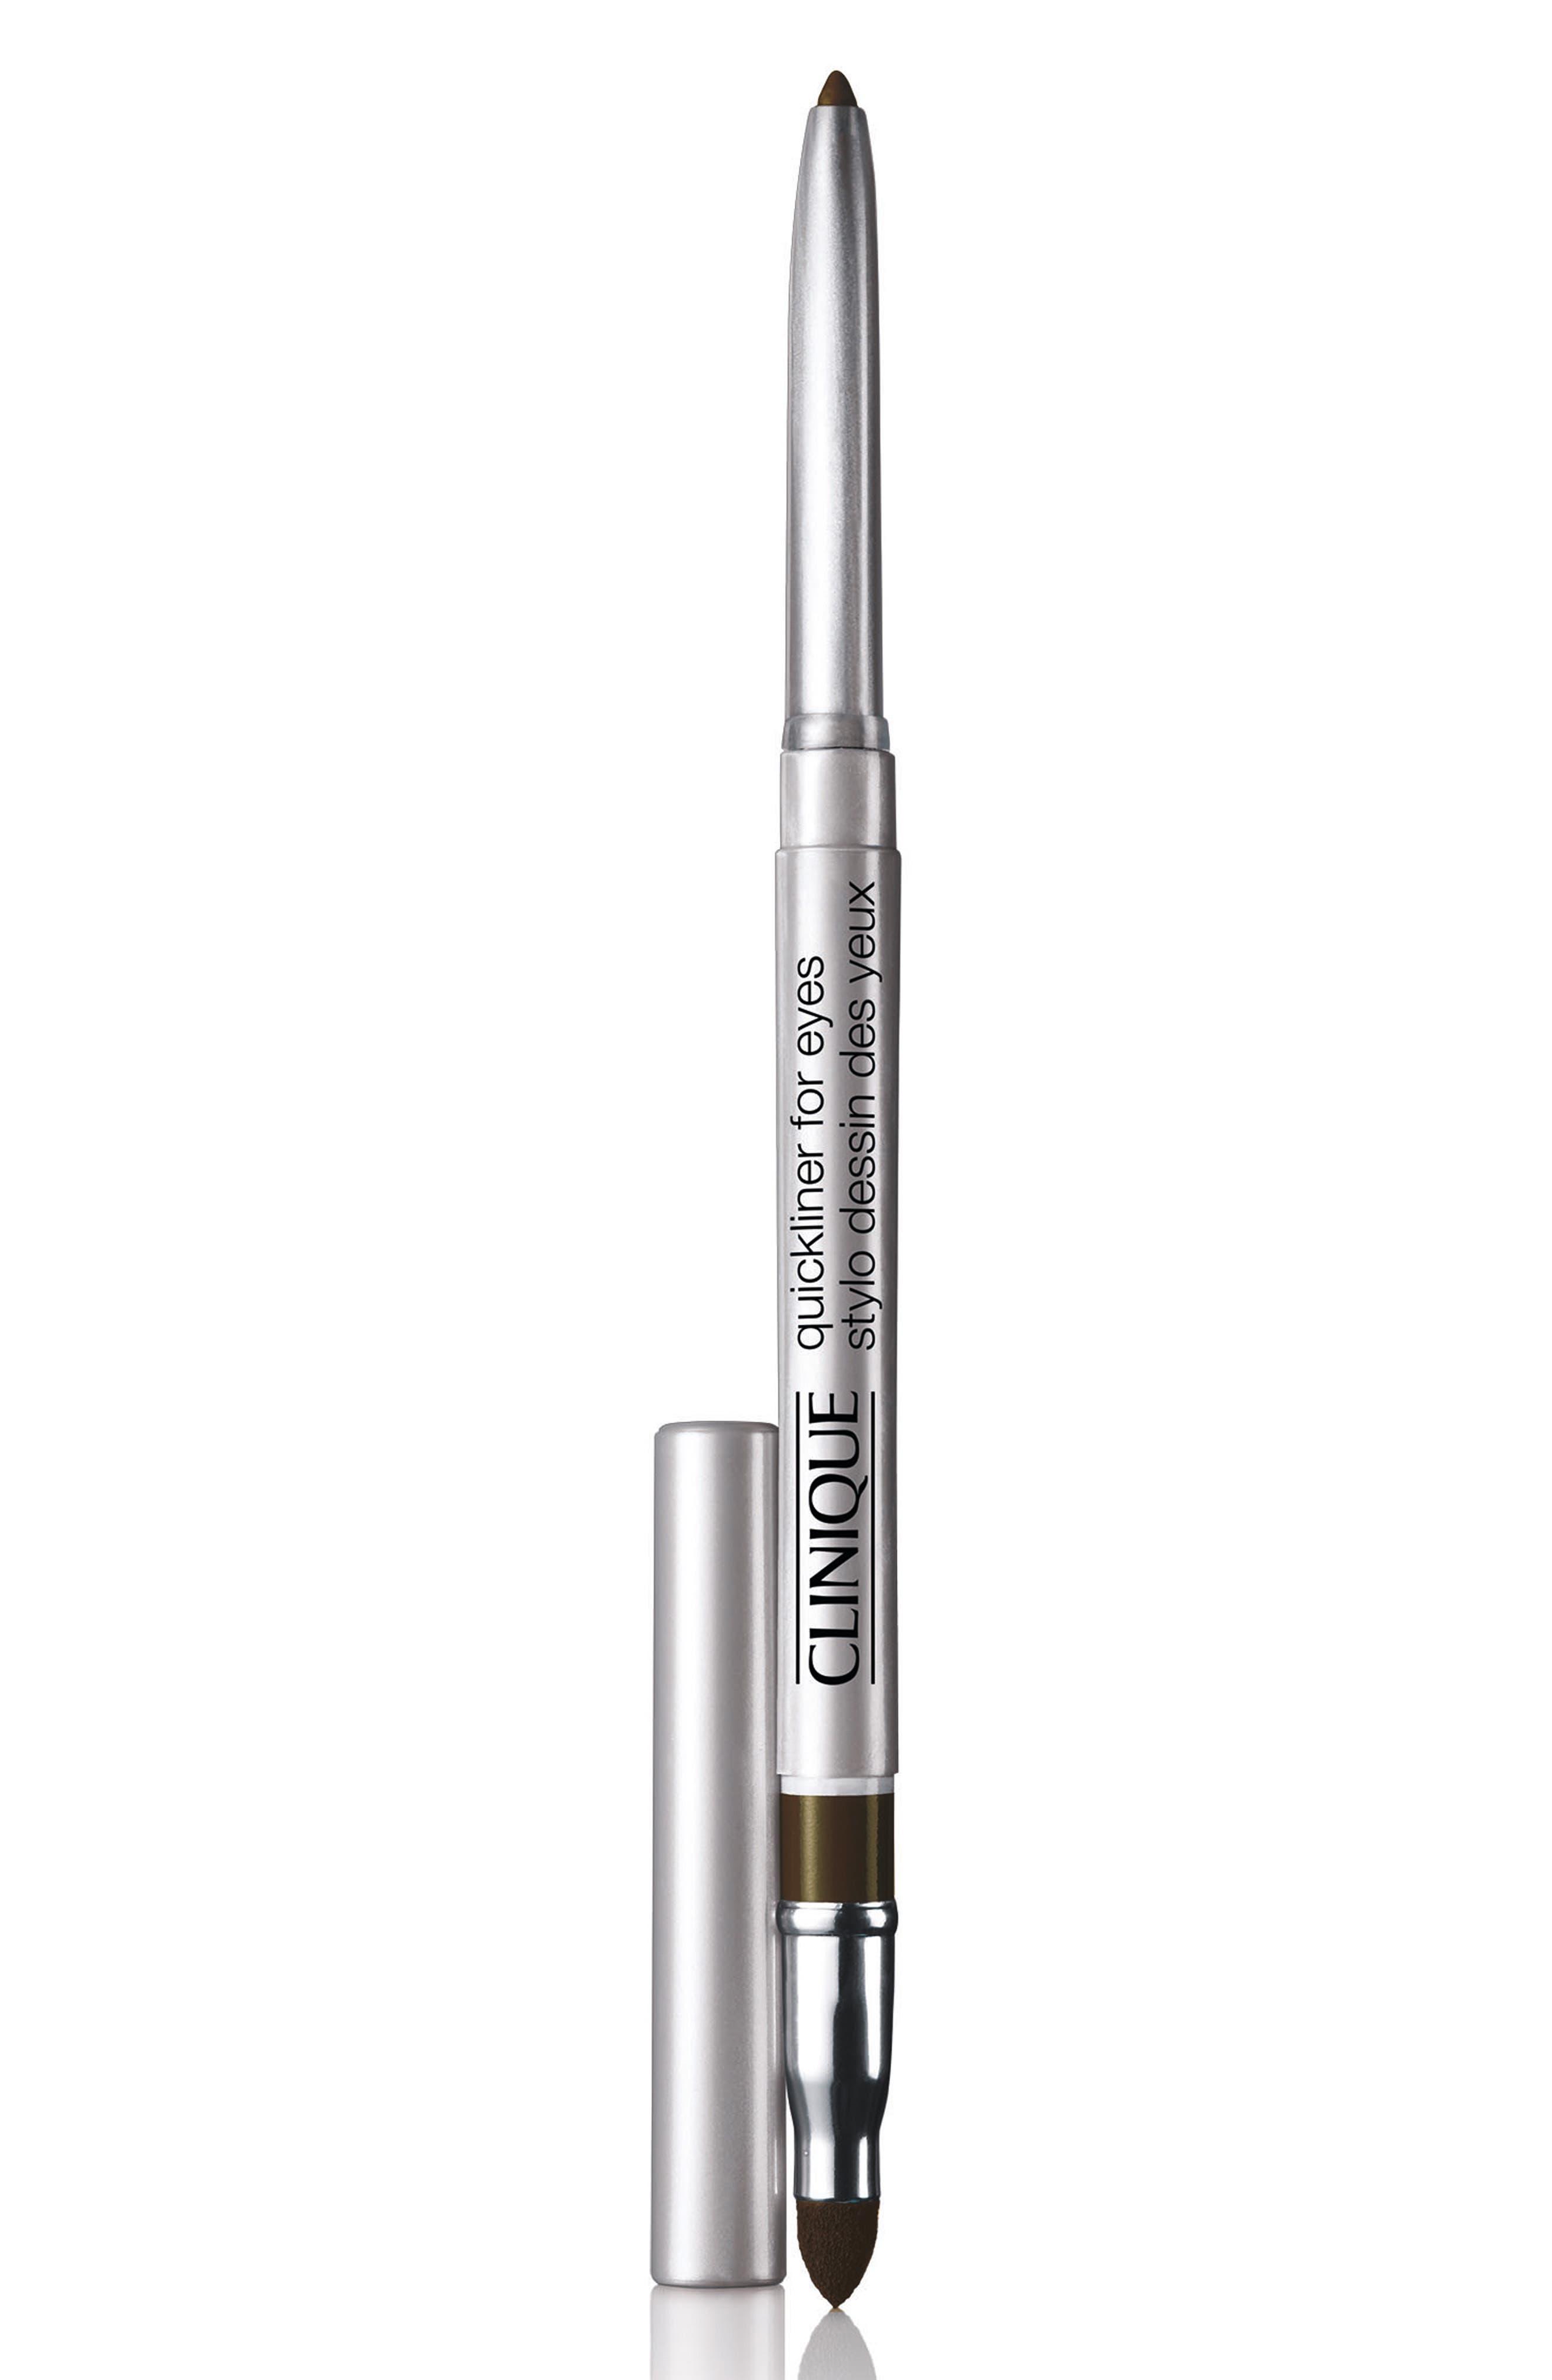 Clinique Quickliner For Eyes Eyeliner Pencil - Dark Chocolate